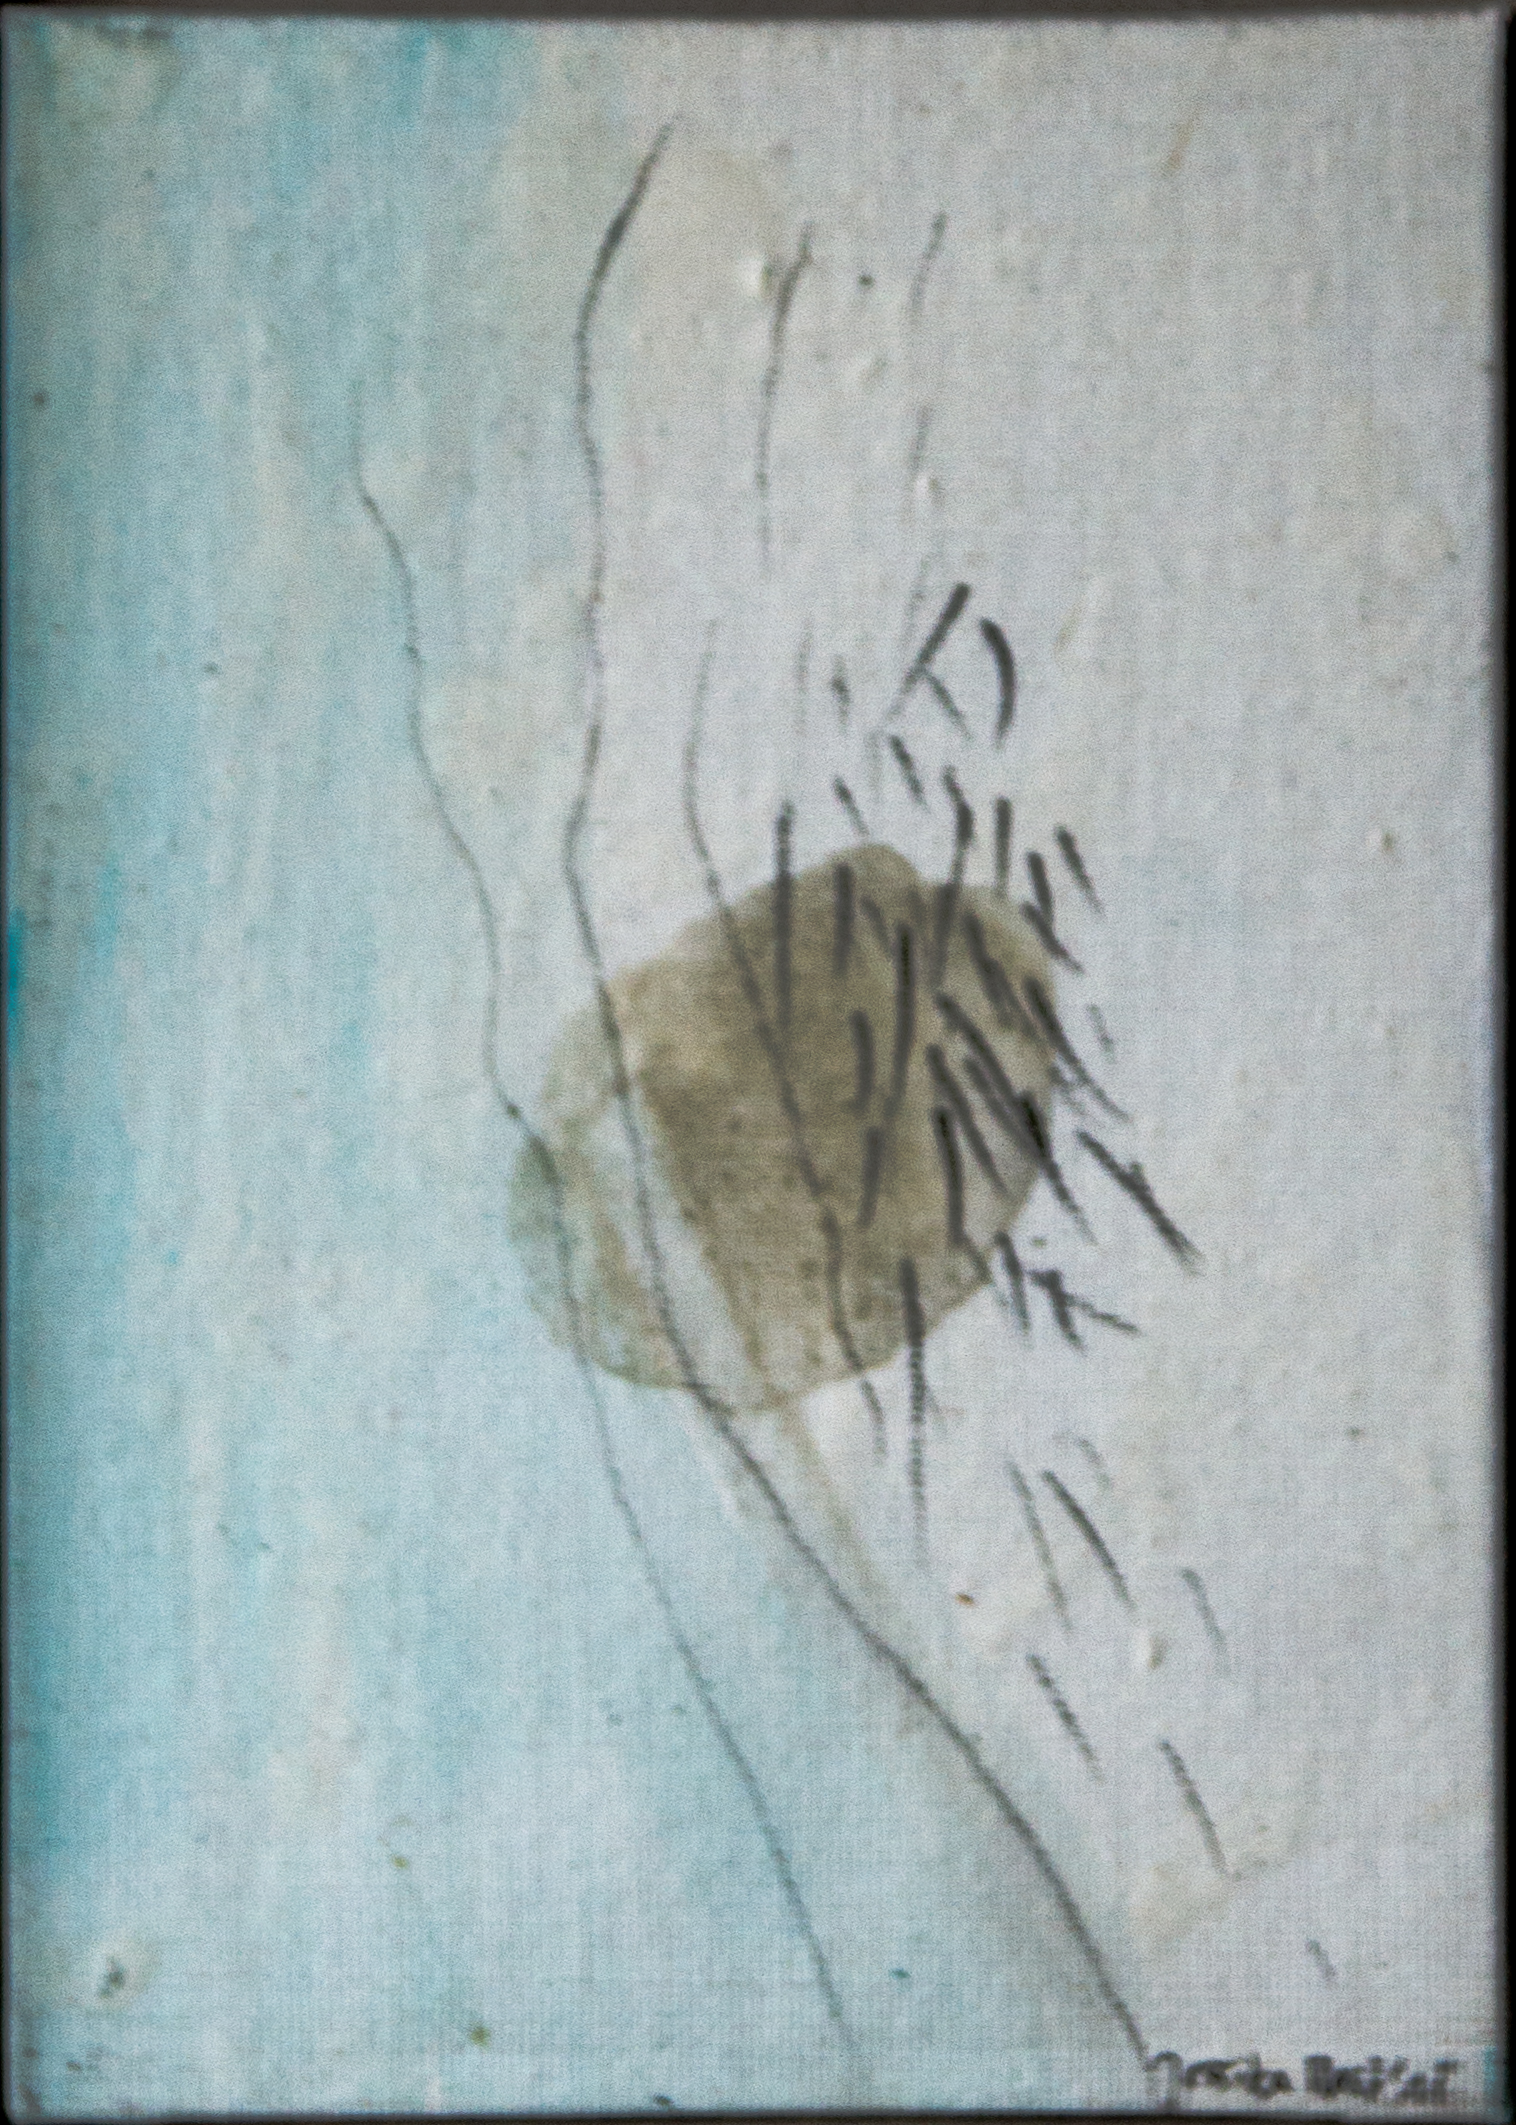 Balance 1: 15x20,Acryl, Gesteinsmehl, Bleistift auf  Leinwandkarton,2016